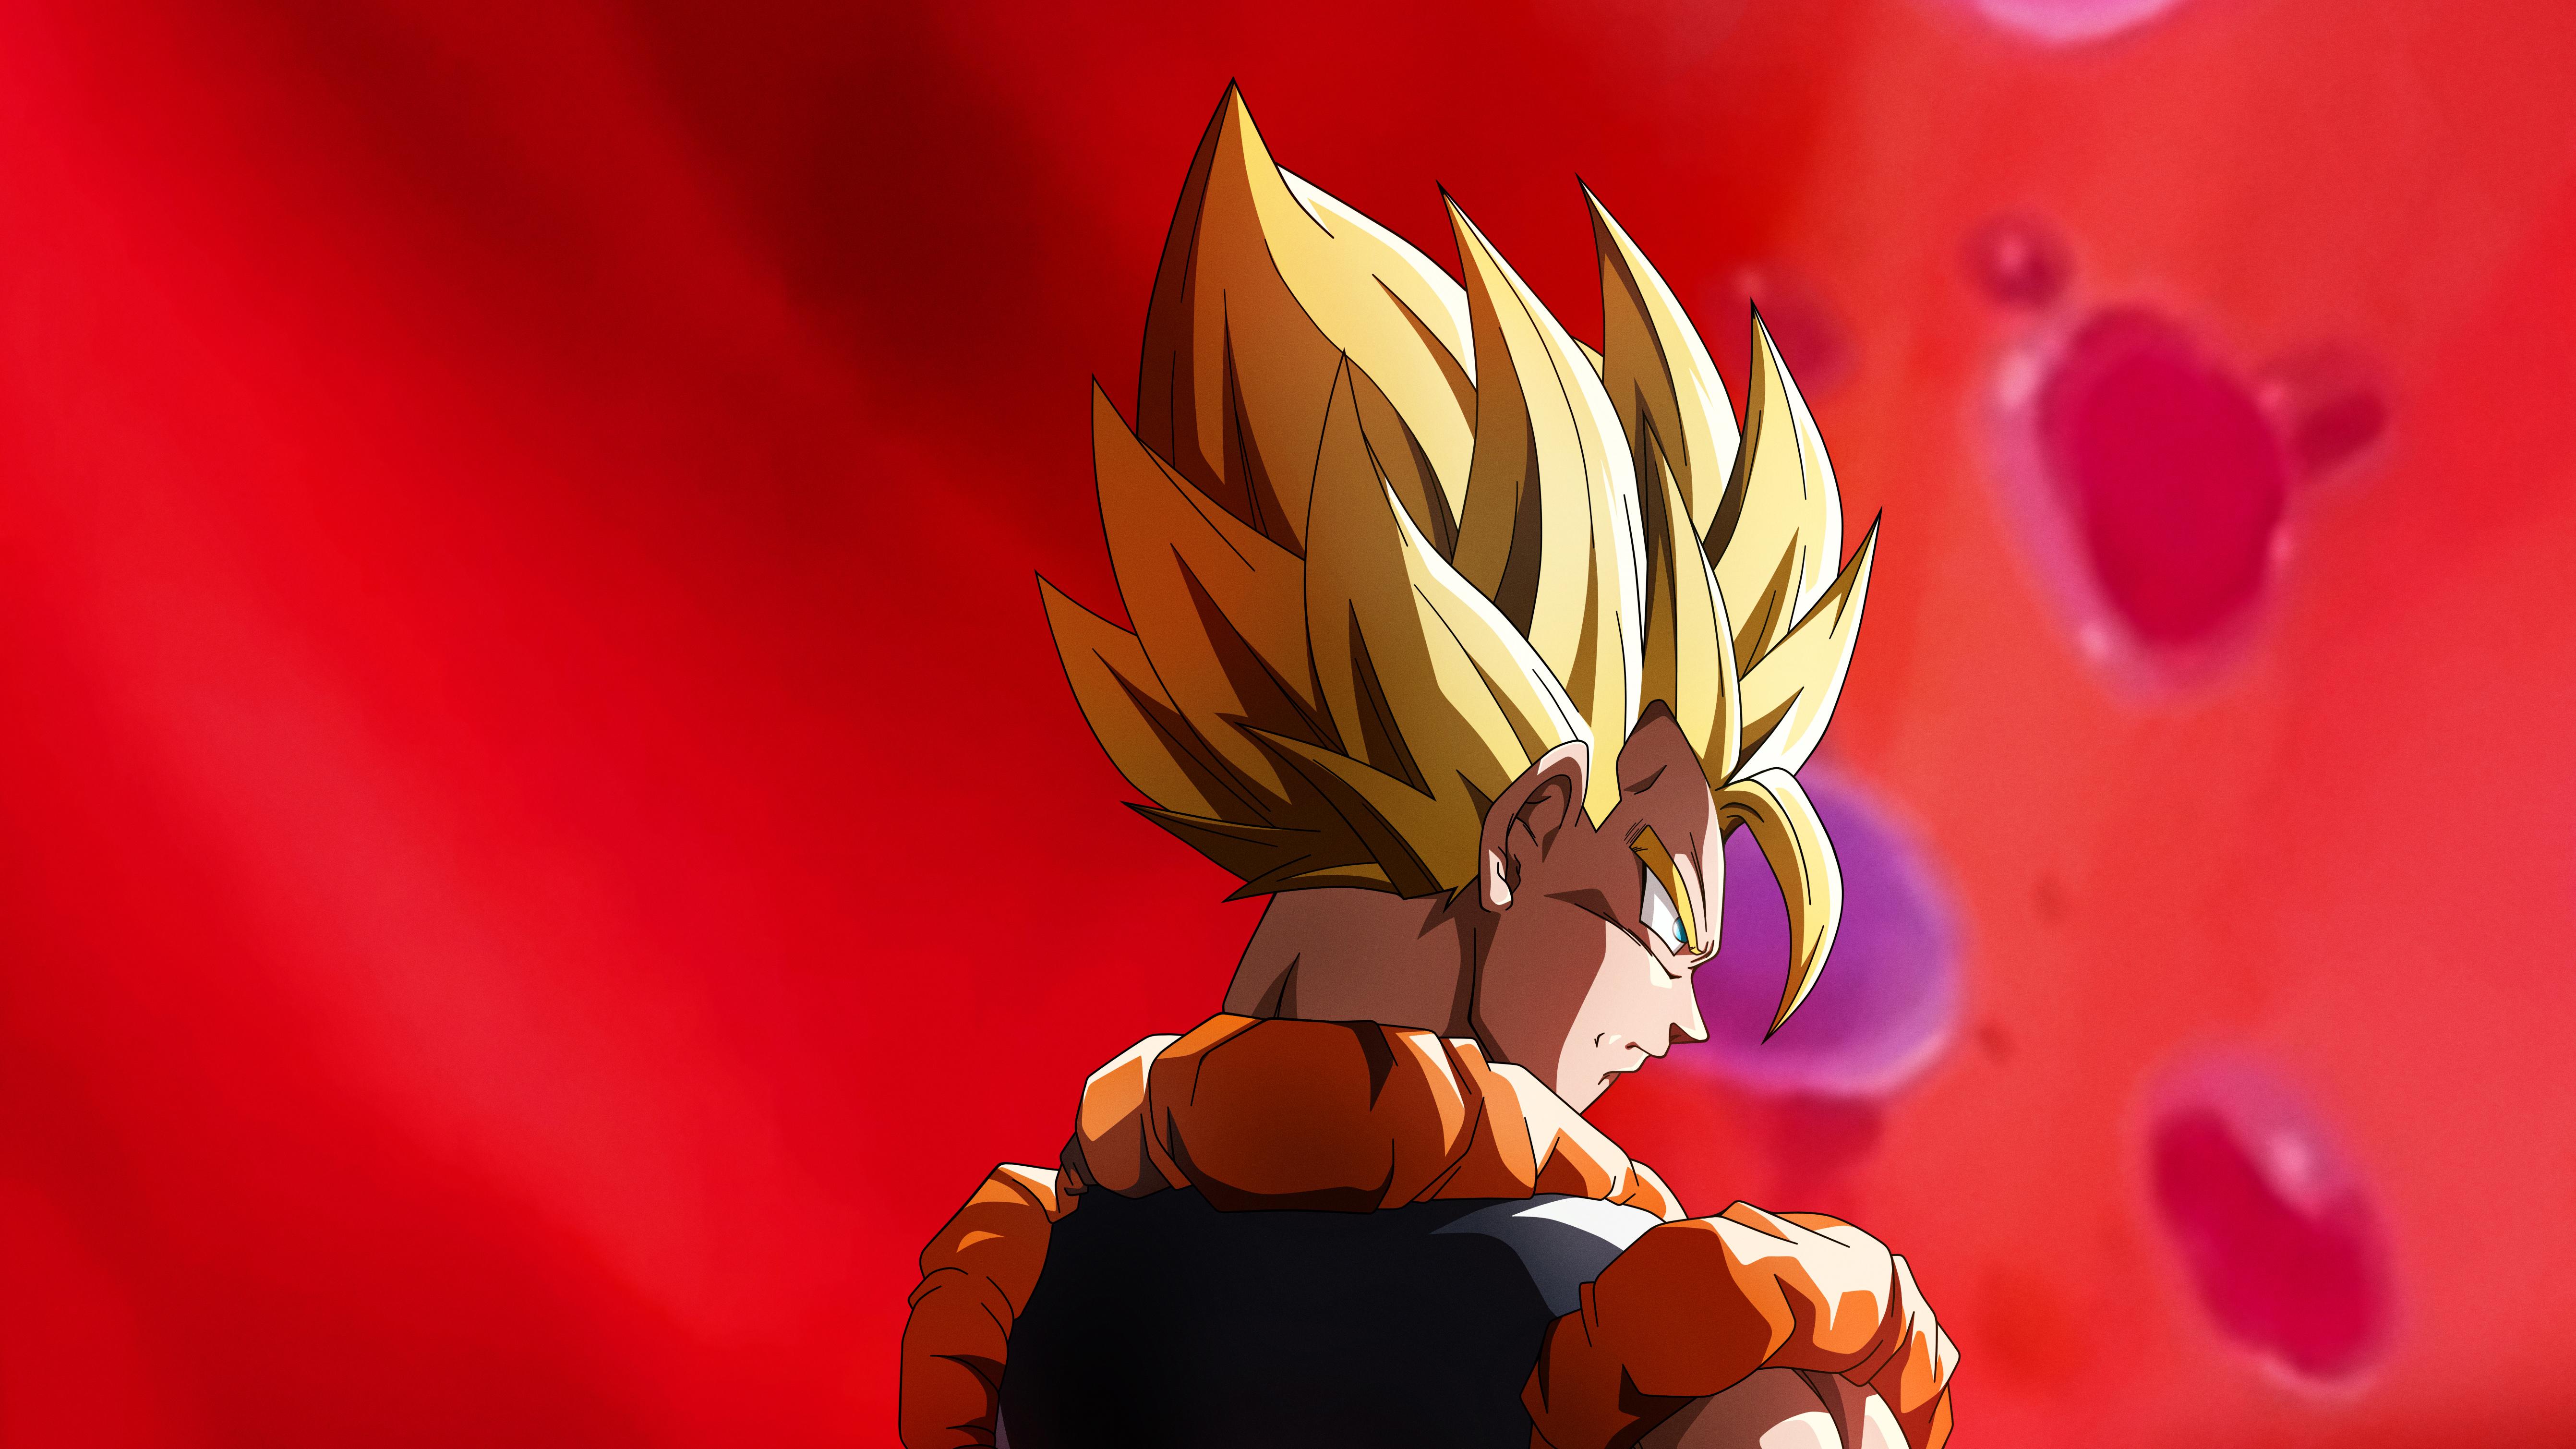 Dragon Ball Goku Ultra Instinct 5k, HD Anime, 4k ...